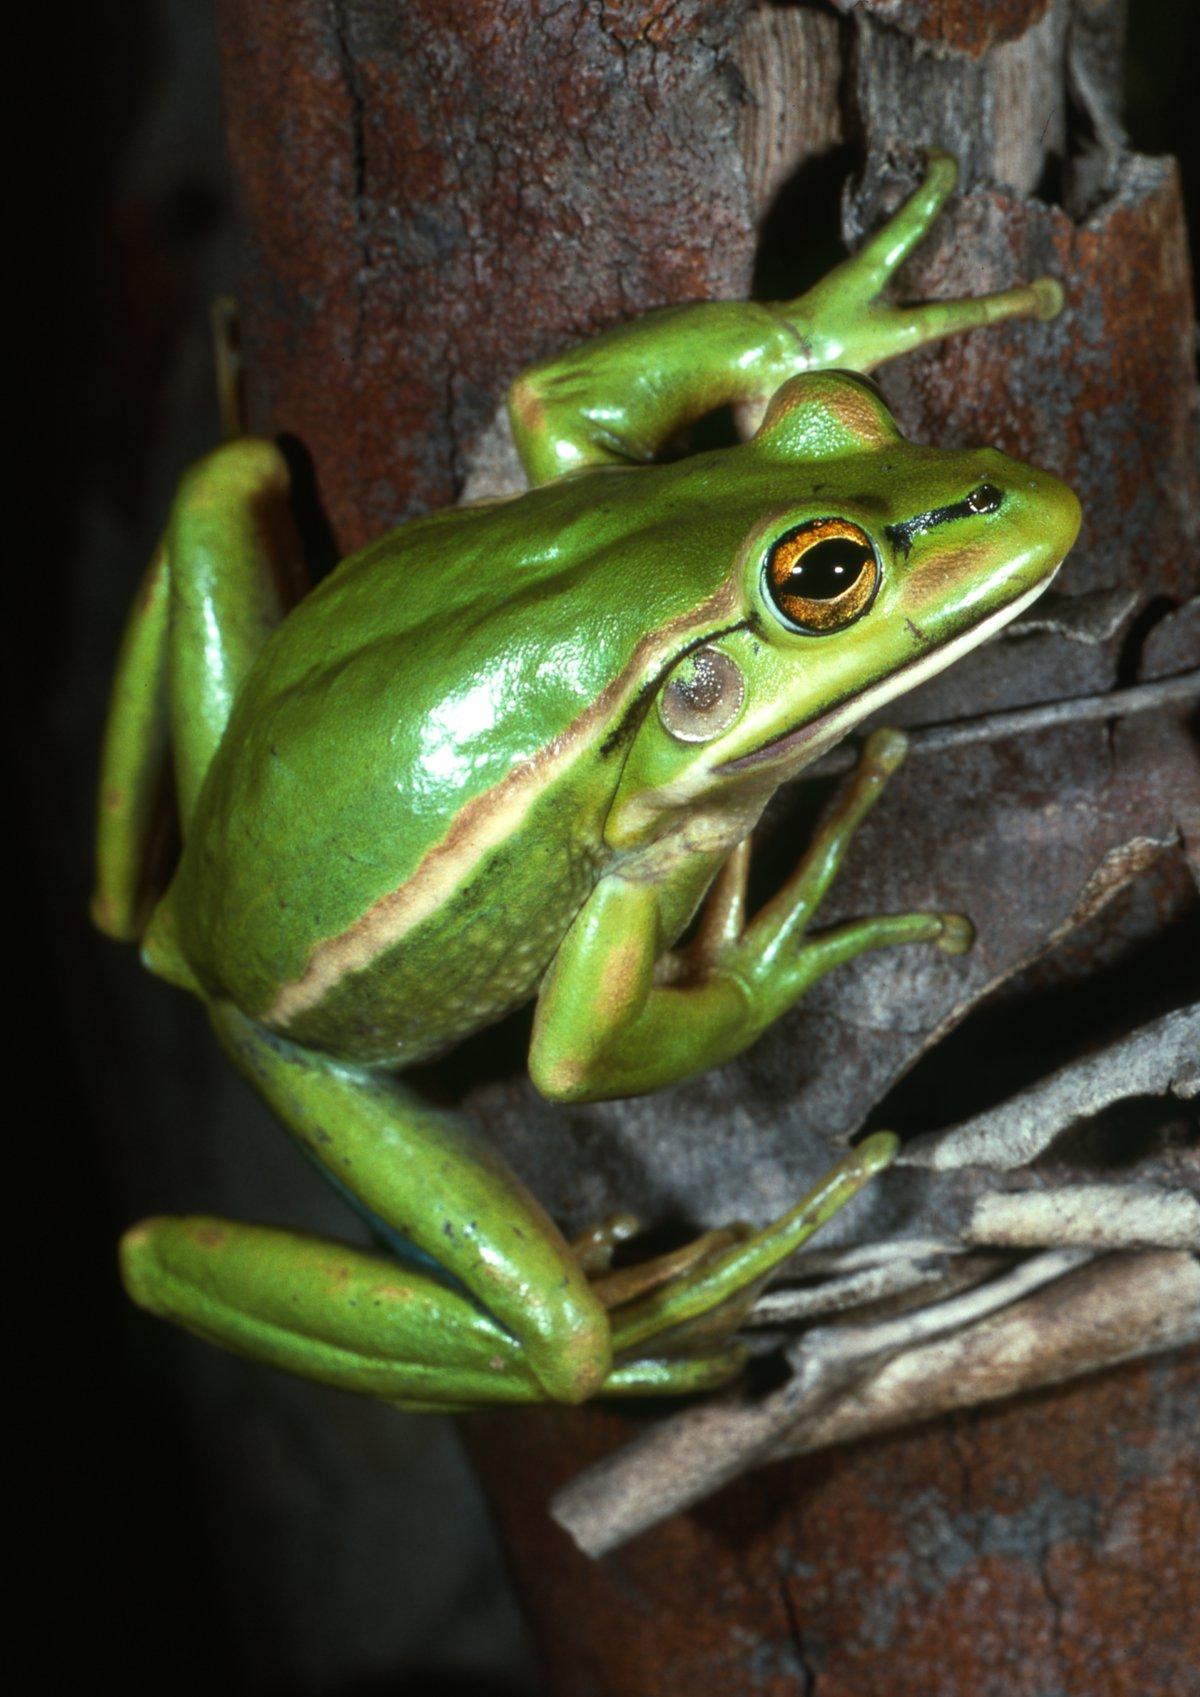 Green and Golden Bell Frog - The Australian Museum